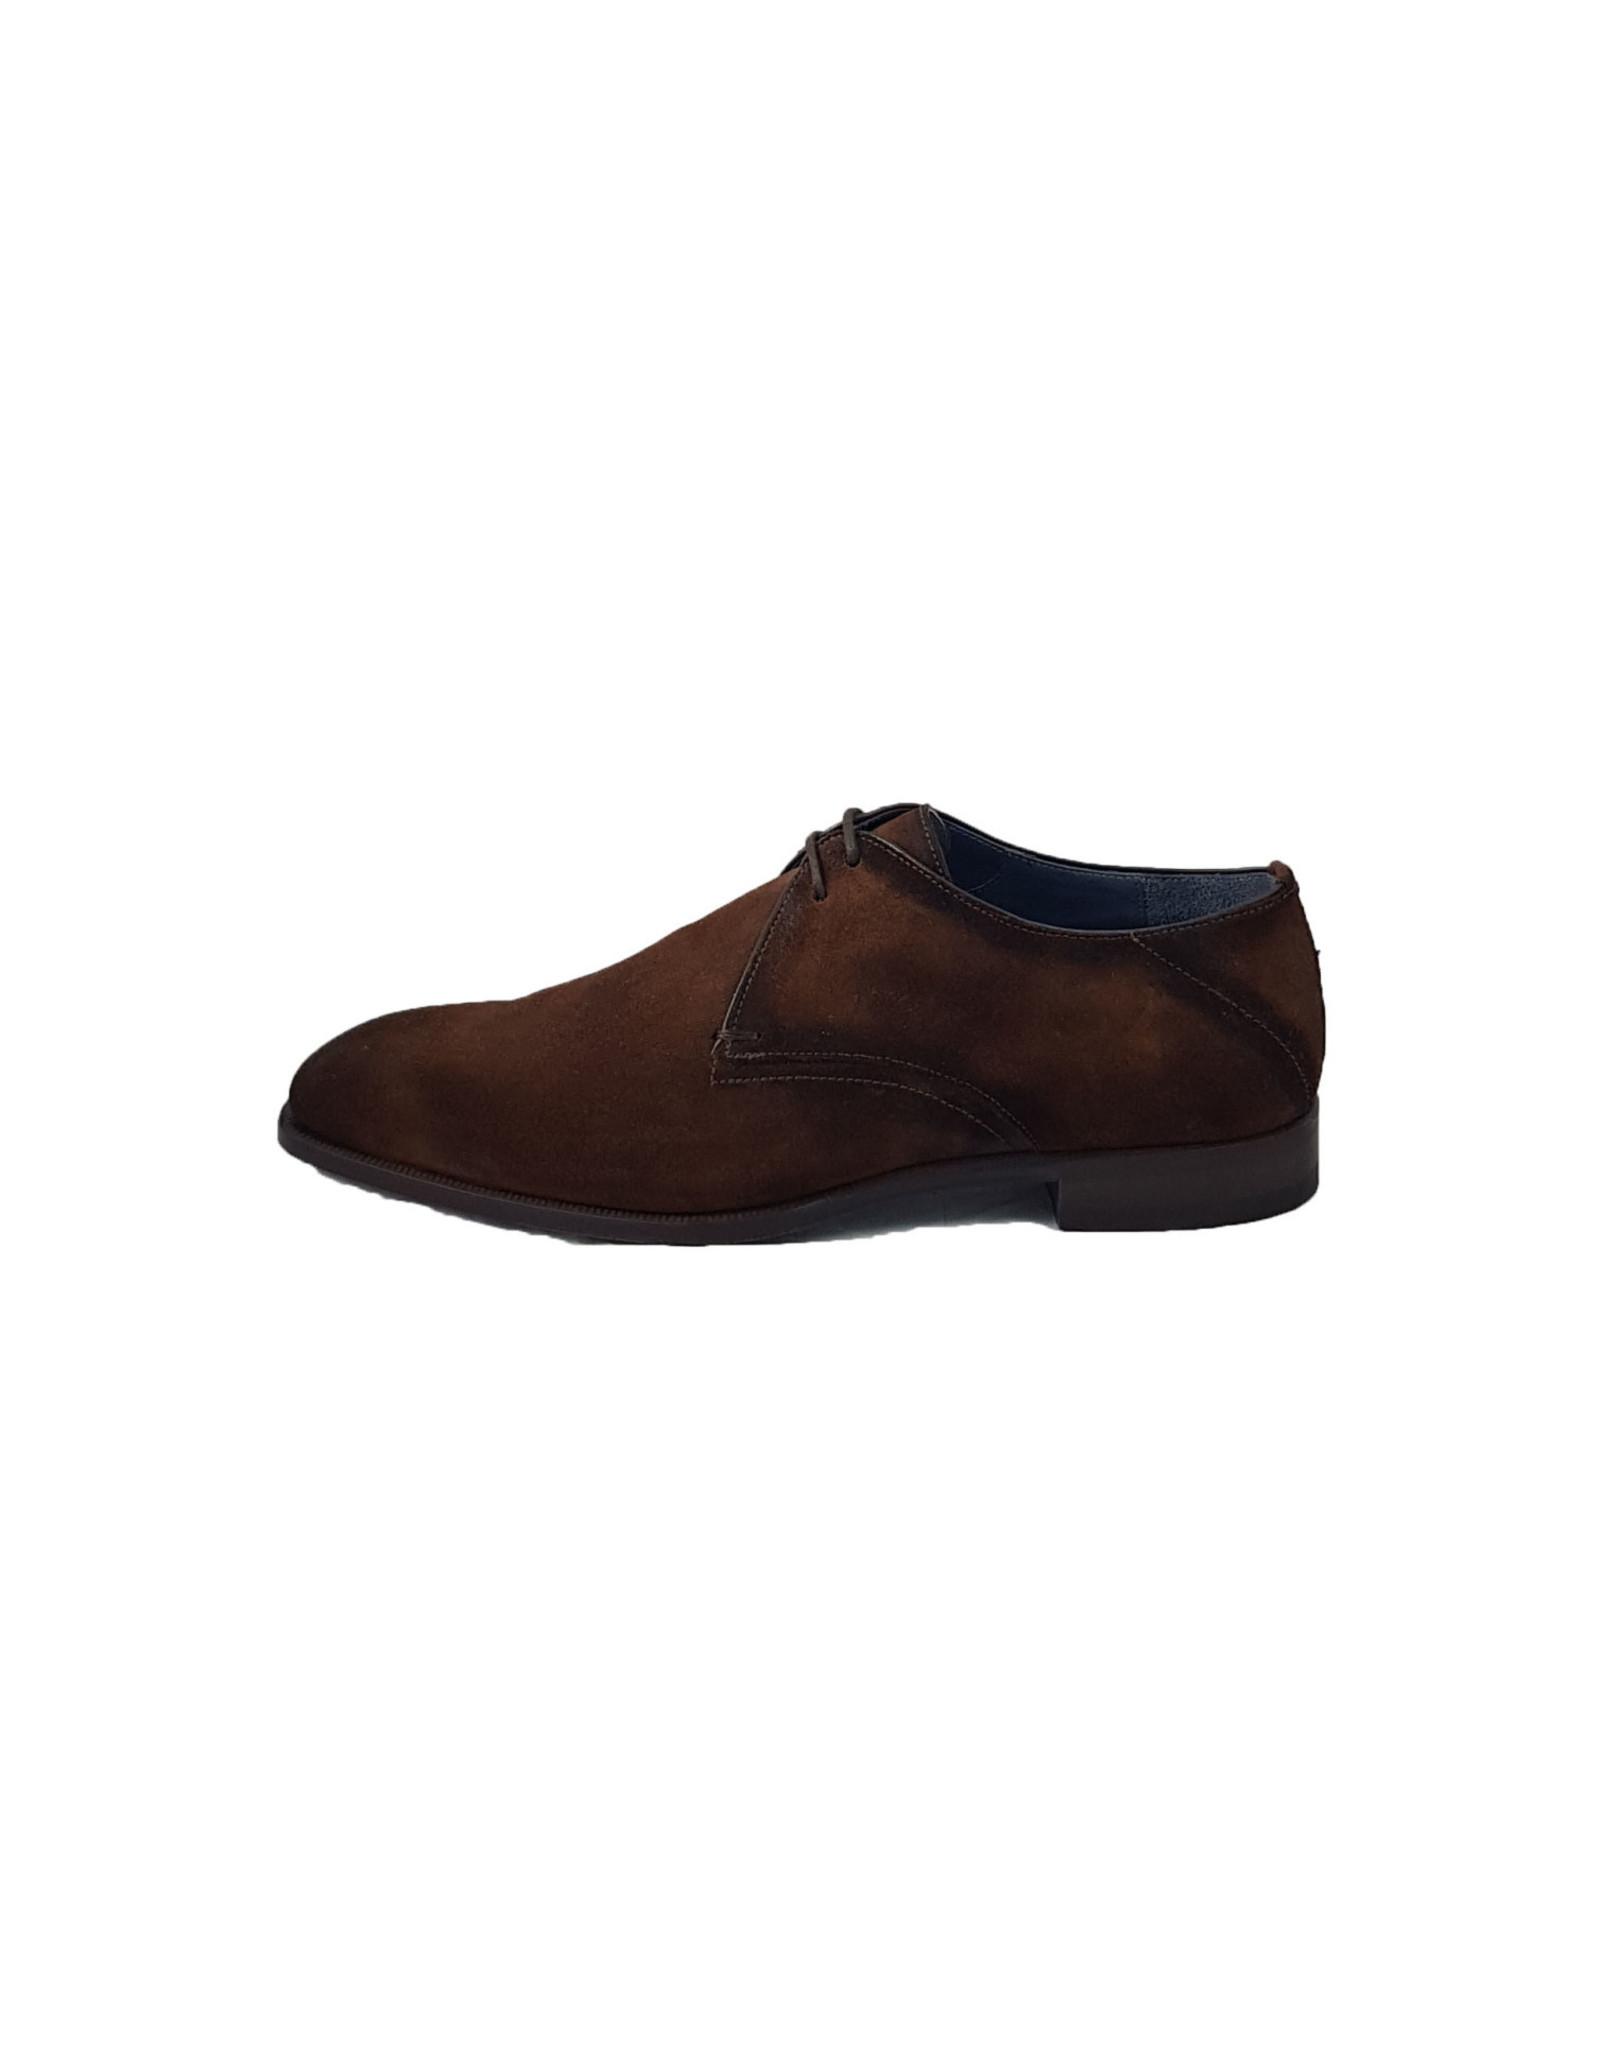 Zampiere Zampiere schoenen bruin Circle snuff M:5166 V18